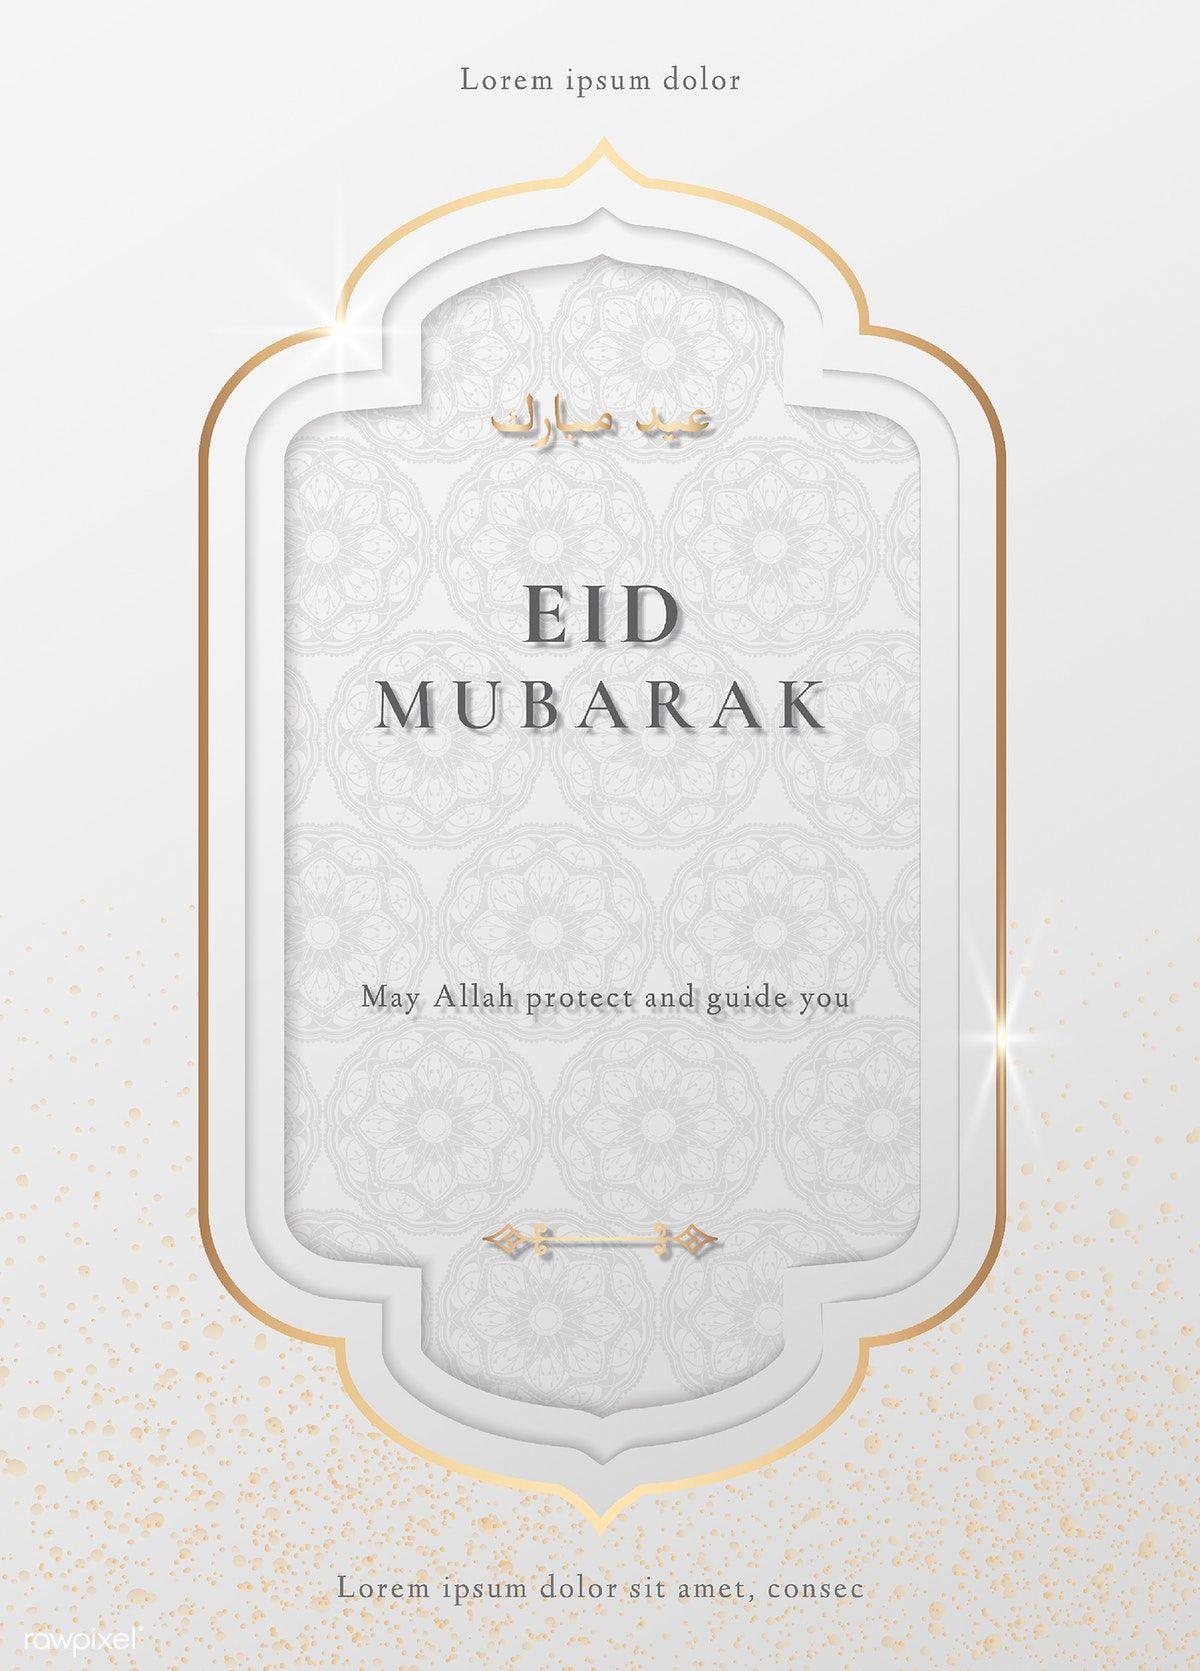 Download Premium Vector Of Festive Eid Mubarak Greeting Card Vector 2262286 Eid Mubarak Greeting Cards Eid Mubarak Card Eid Card Designs